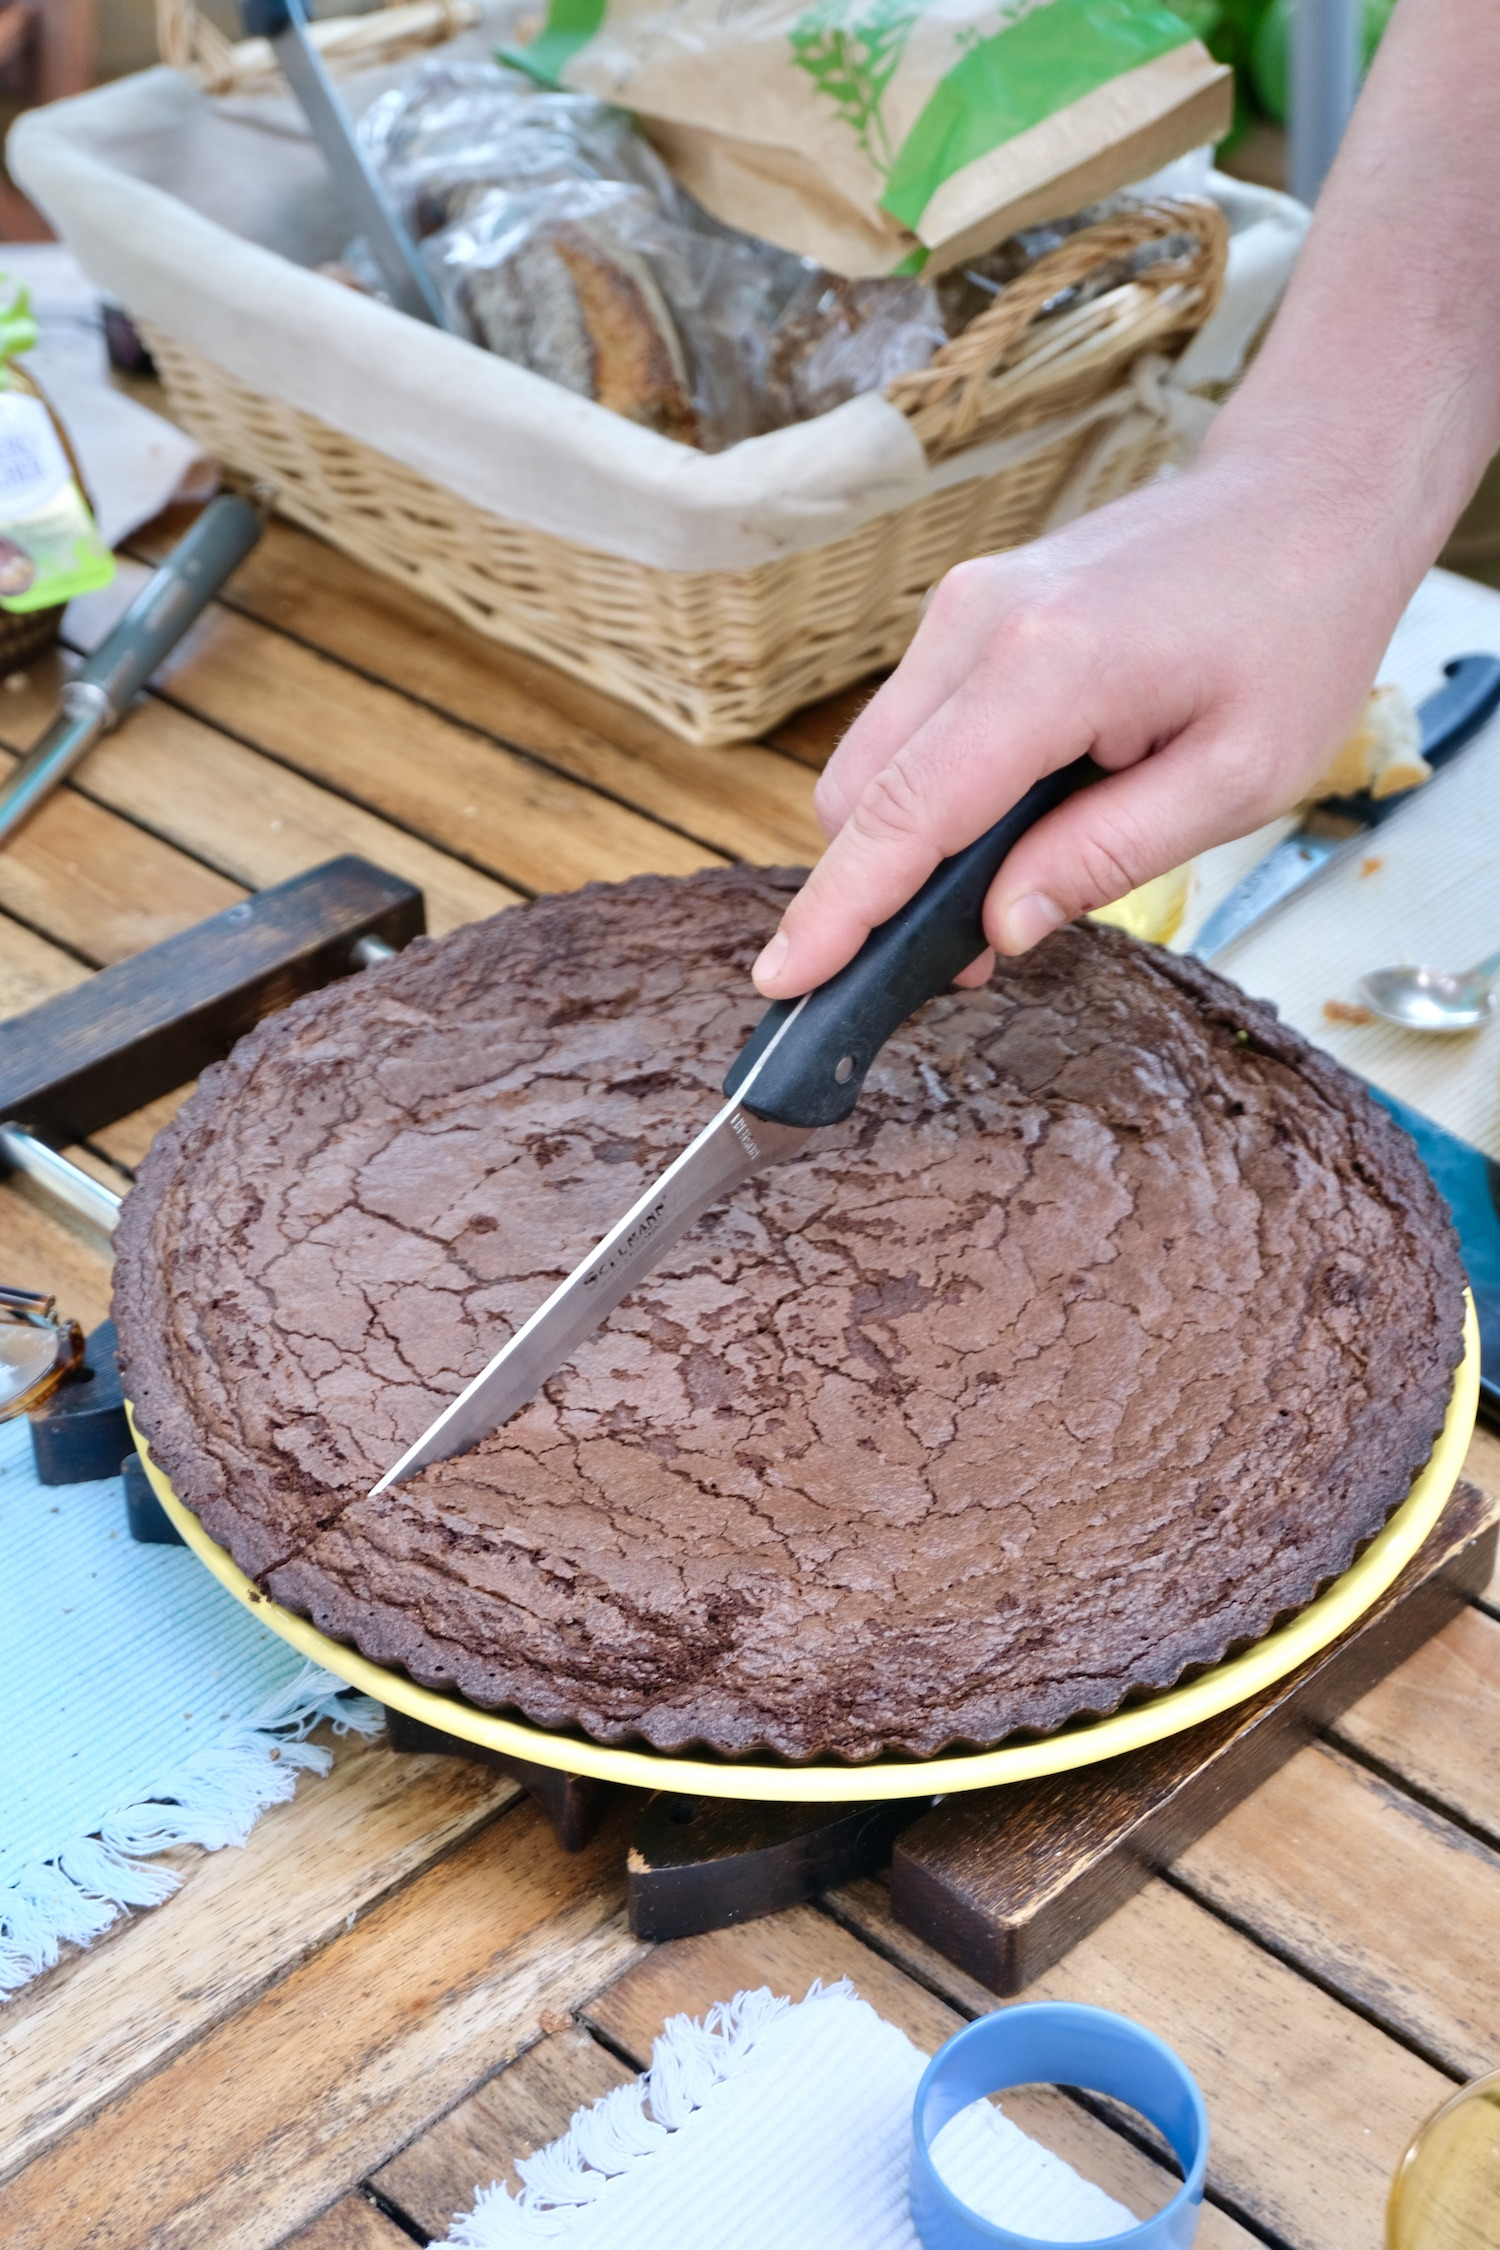 Cutting the Pierre Hermé Gâteau Suzy chocolate cake